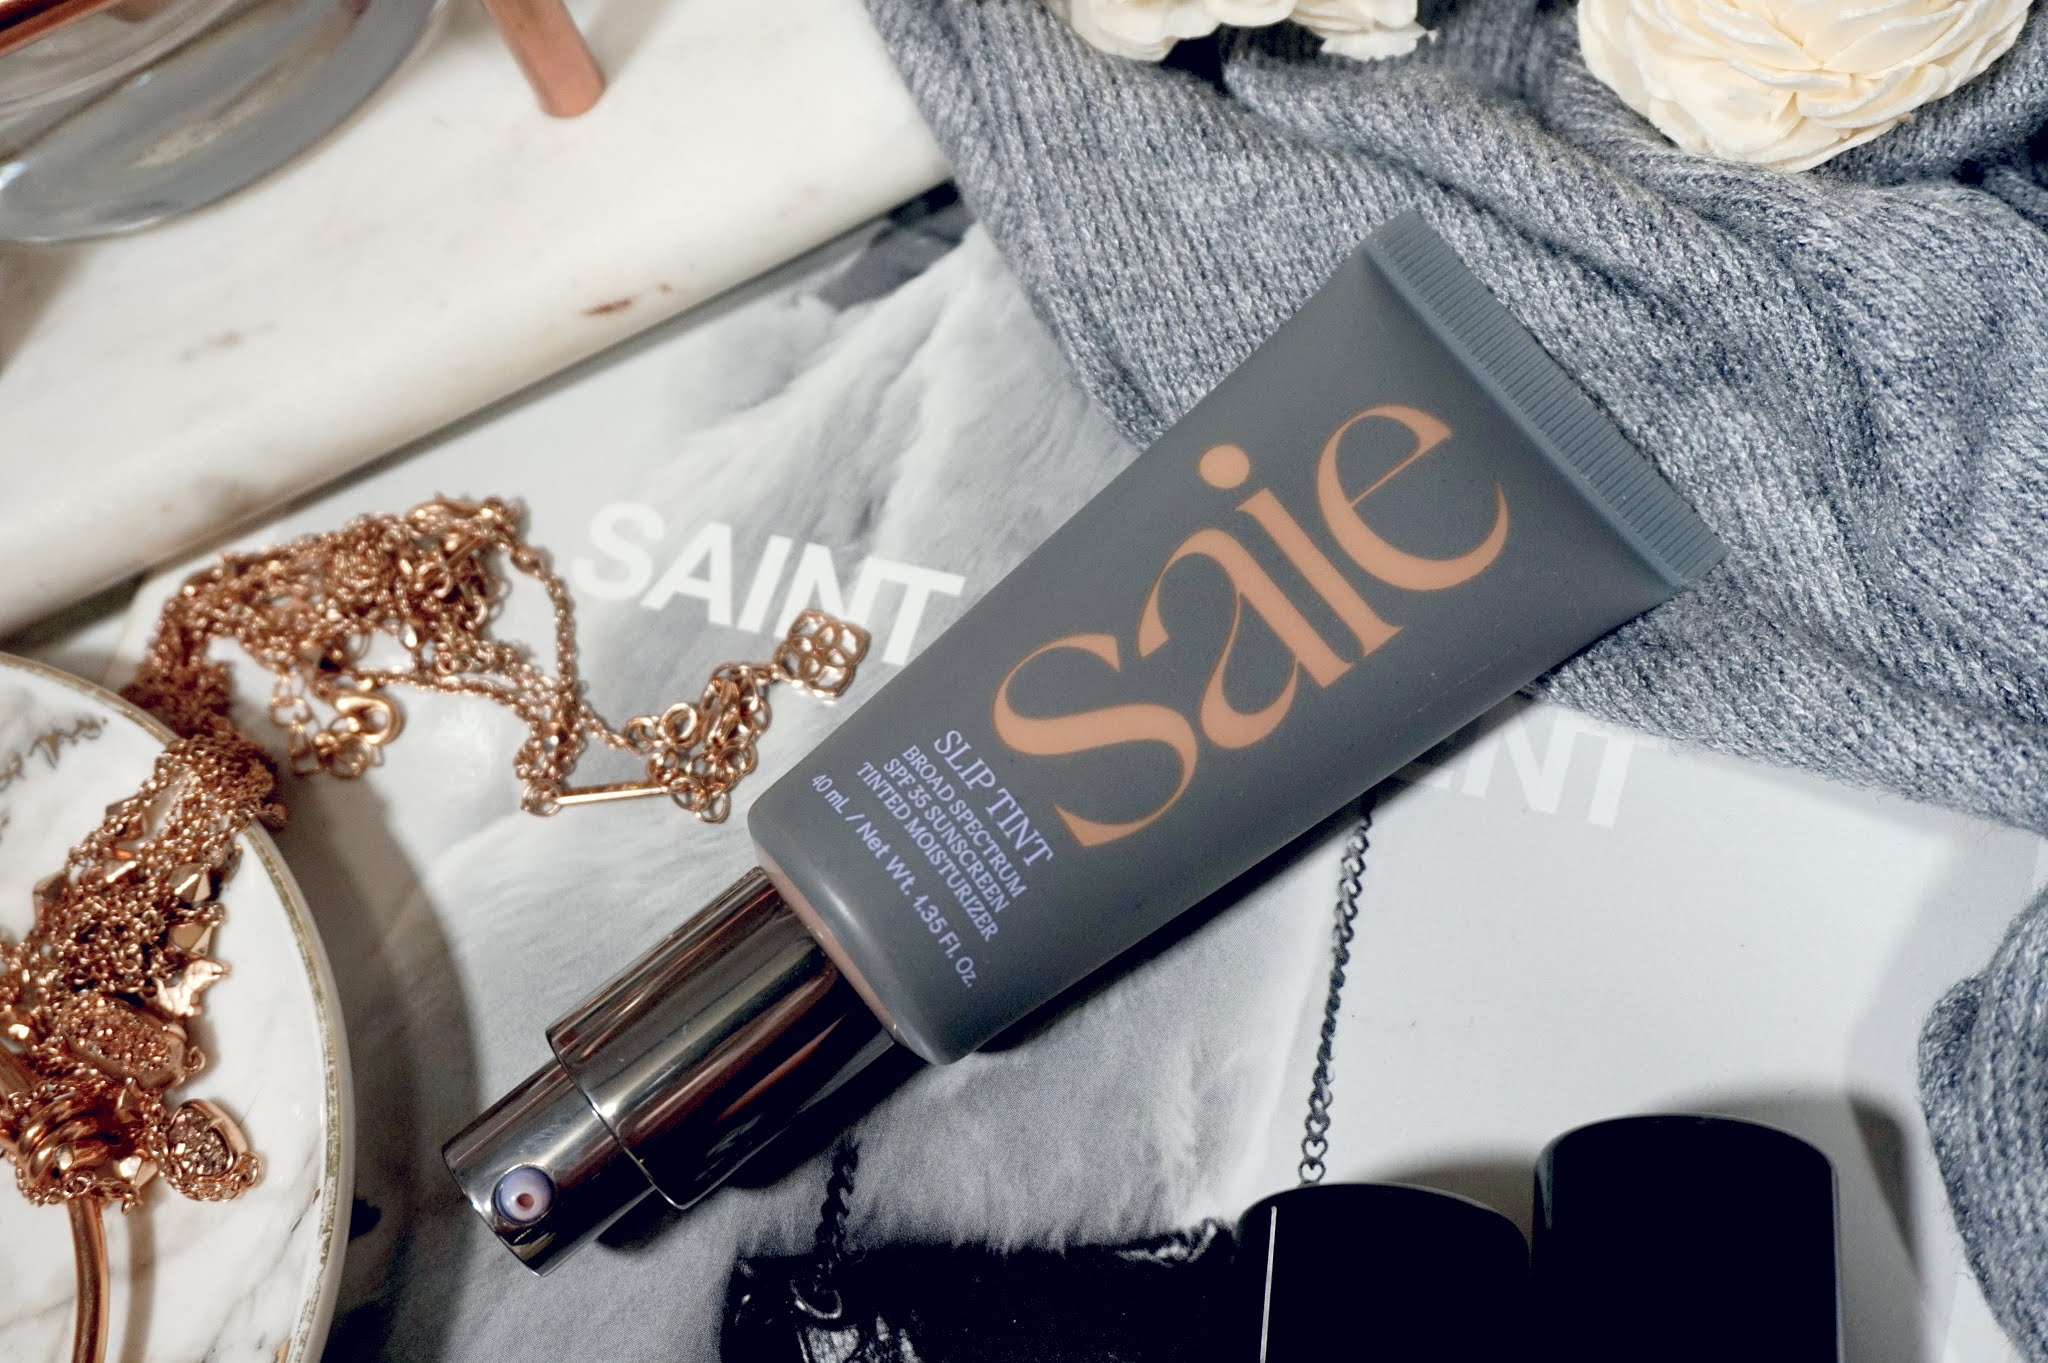 Saie Slip Tint Dewy Tinted Moisturizer SPF 35 Sunscreen